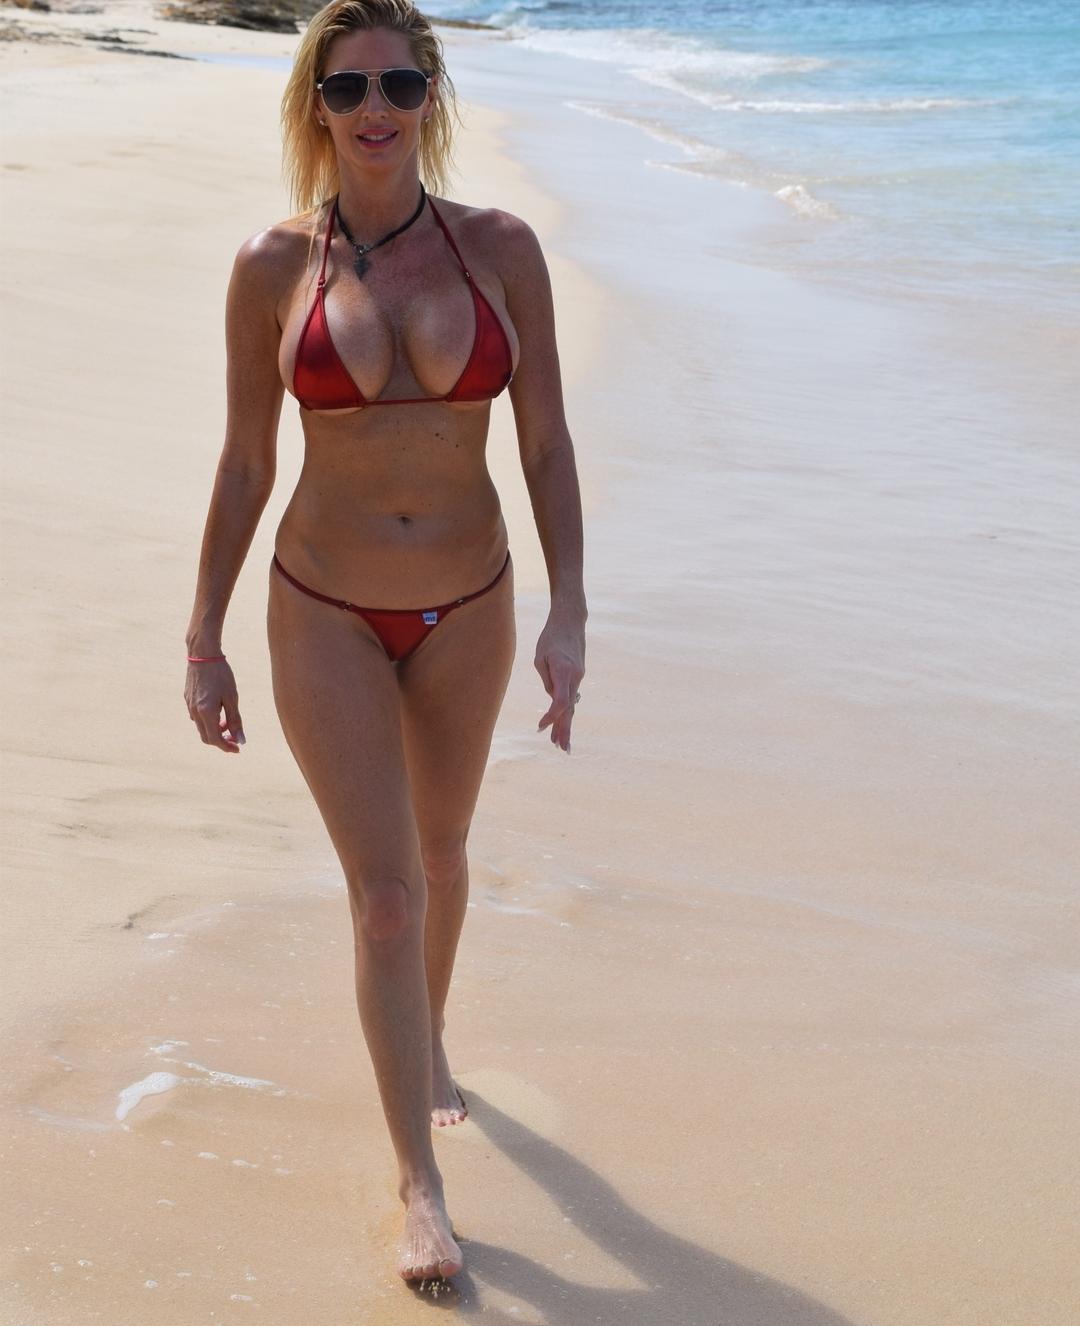 Bellasouth Lavidahermosa Onlyfans Nudes Leaks 0016